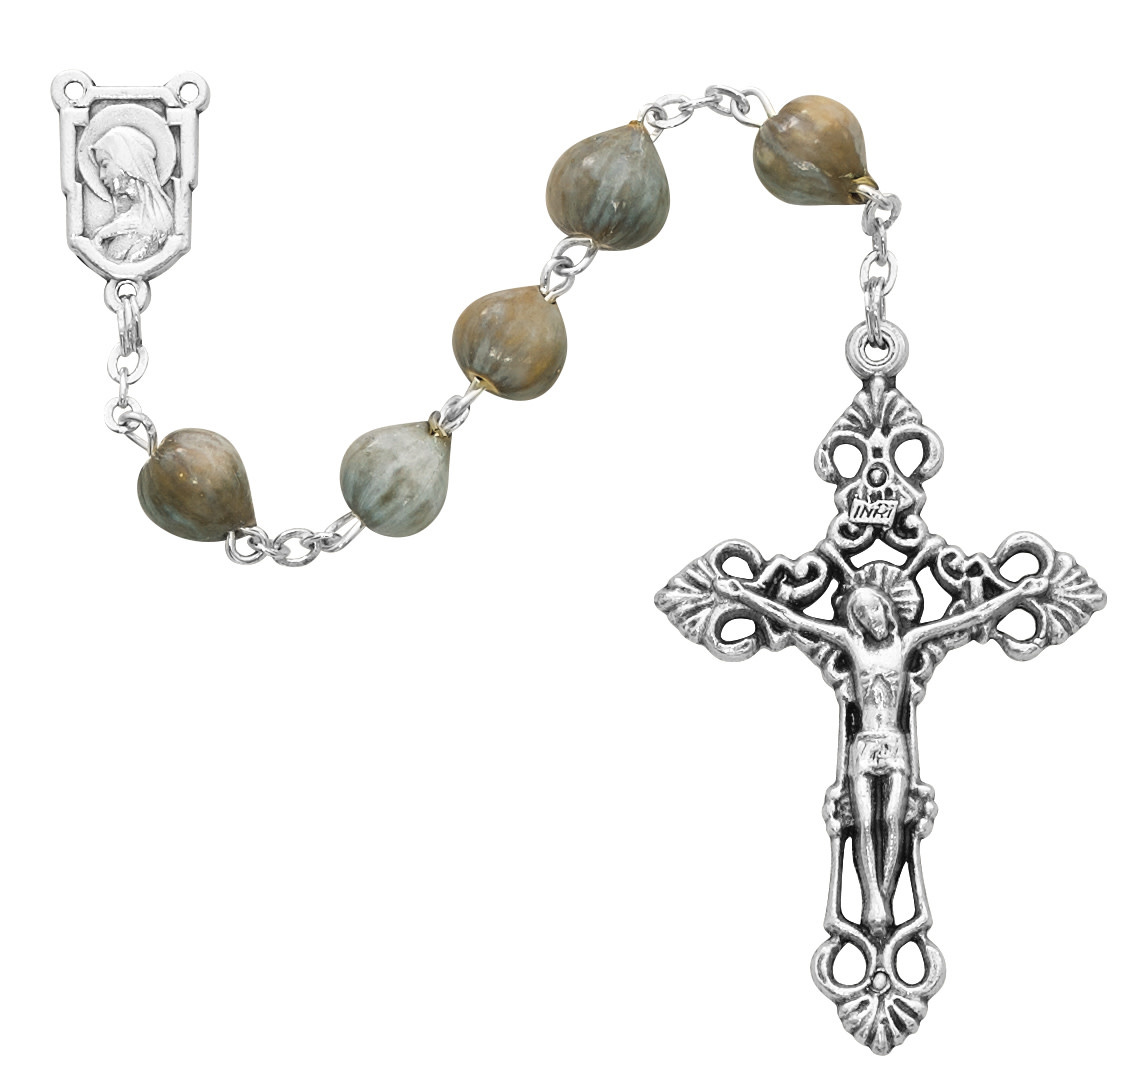 McVan Job's Tears Rosary